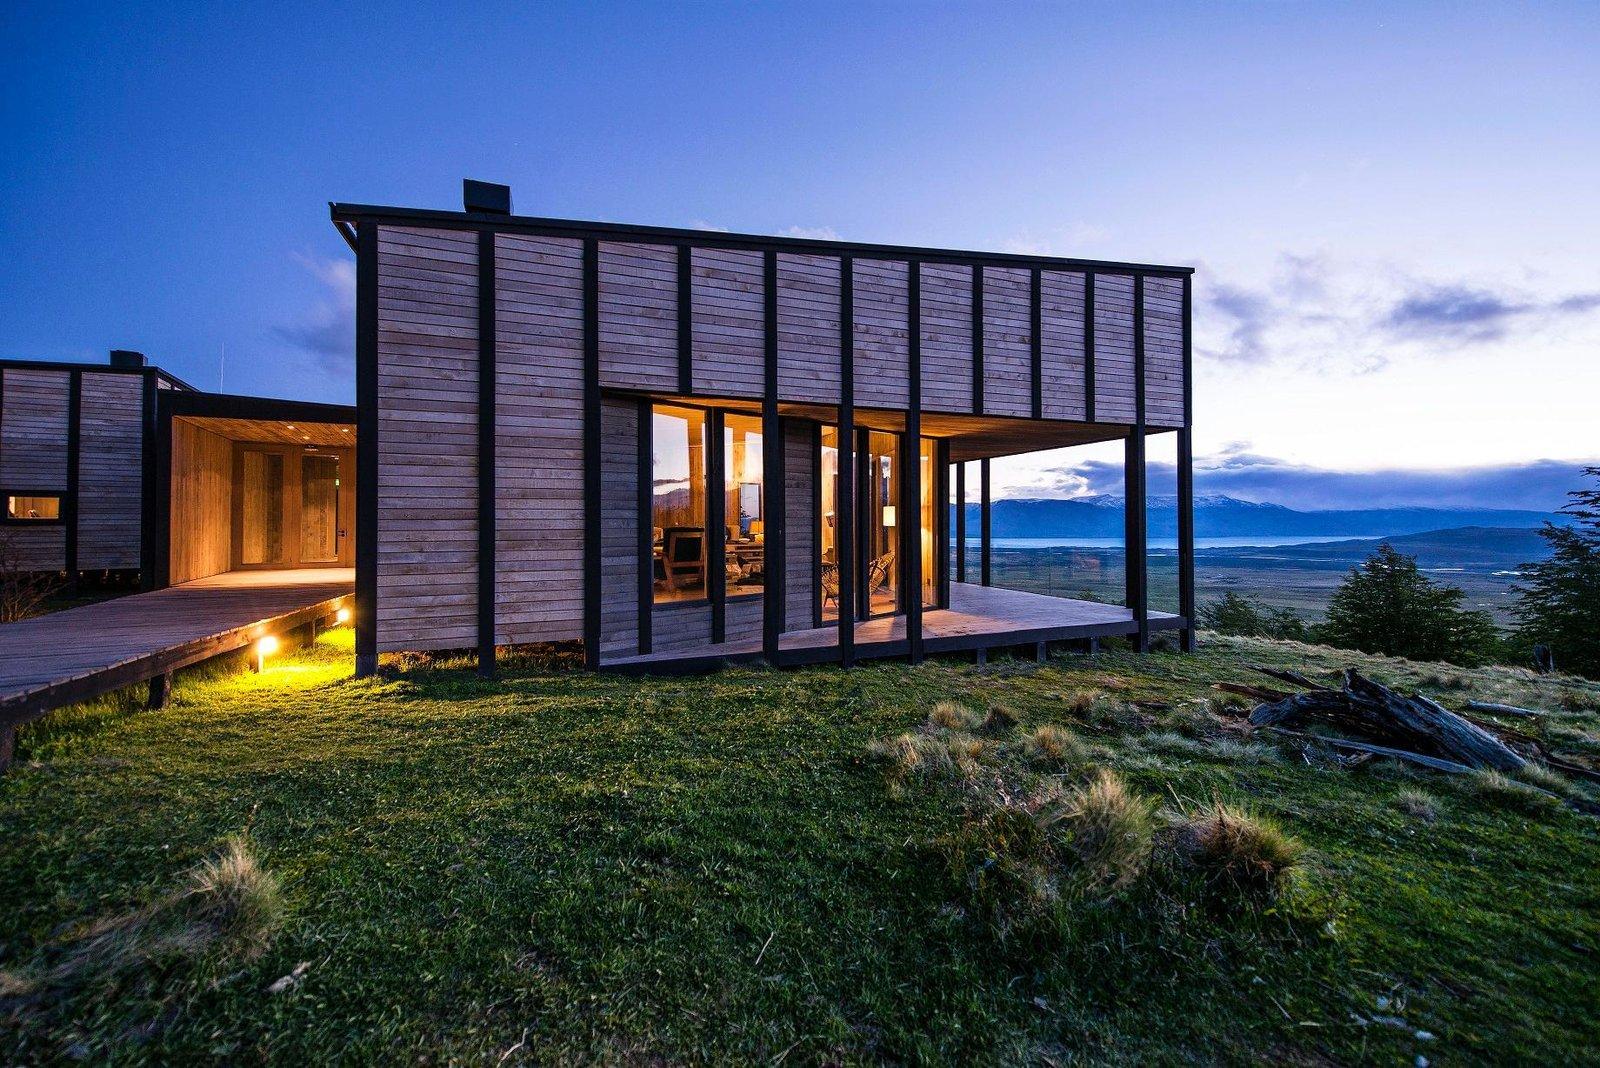 Outdoor, Shrubs, Small Patio, Porch, Deck, and Grass  Awasi Patagonia